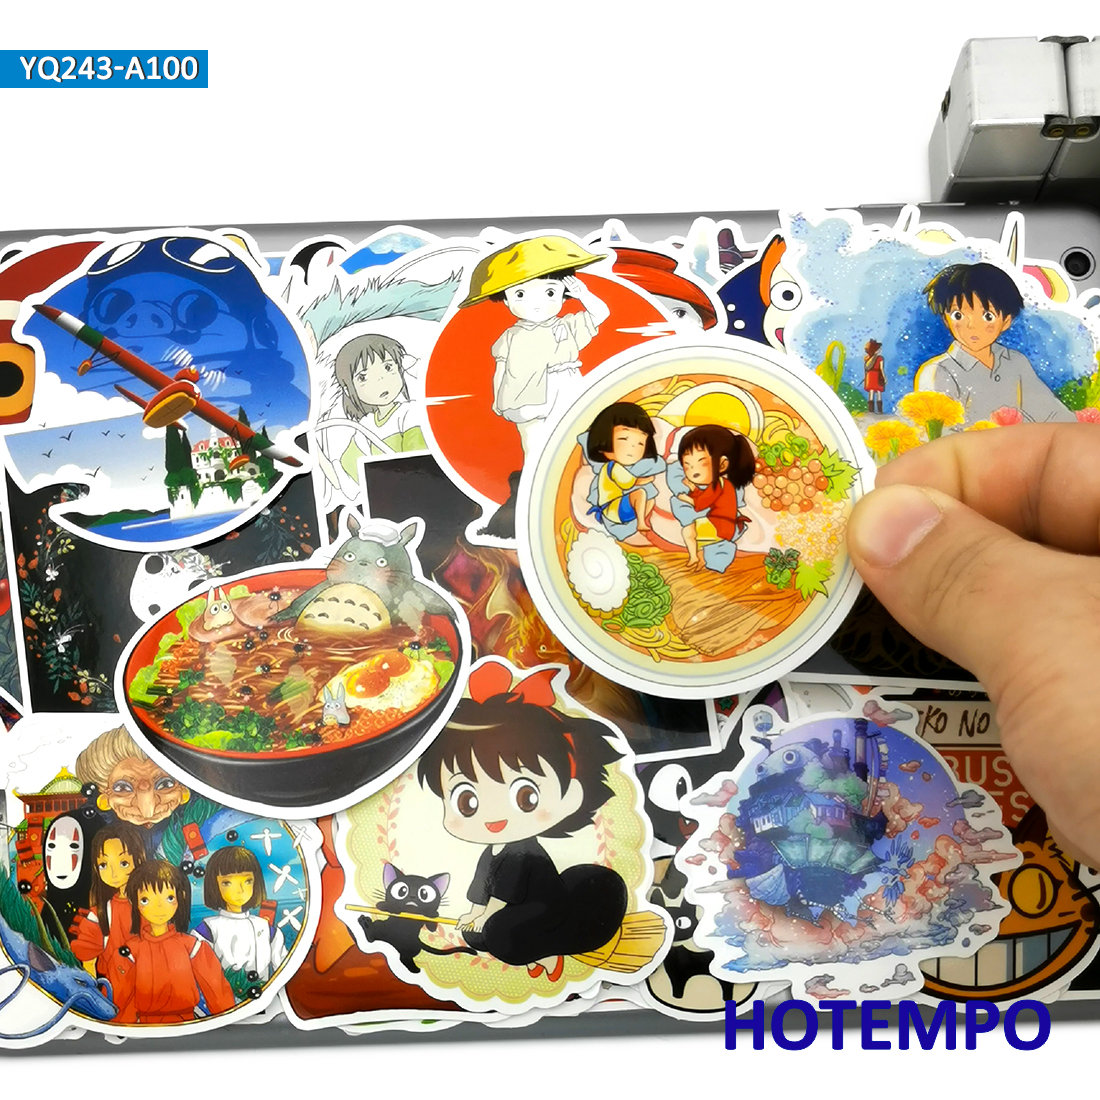 100pcs Manga Miyazaki Hayao Classic Cute Anime Movie Stickers Toy for Kid Mobile Phone Laptop Luggage Skateboard Cartoon Sticker(China)